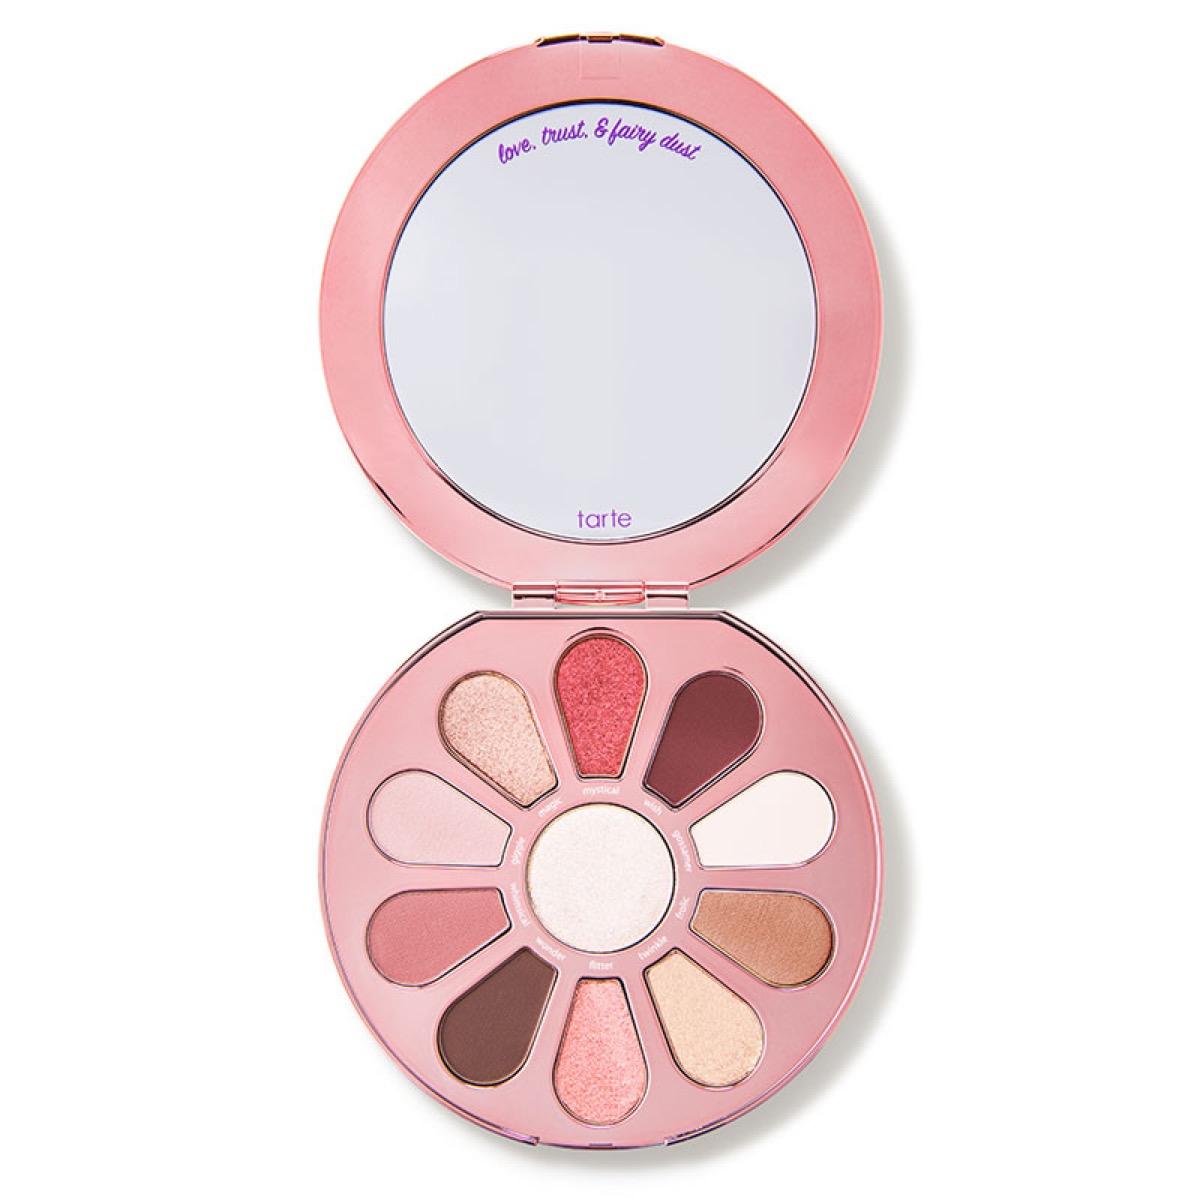 Tarte Cosmetics Love, Trust & Fairy Dust Eyeshadow Palette (3.57 oz.)